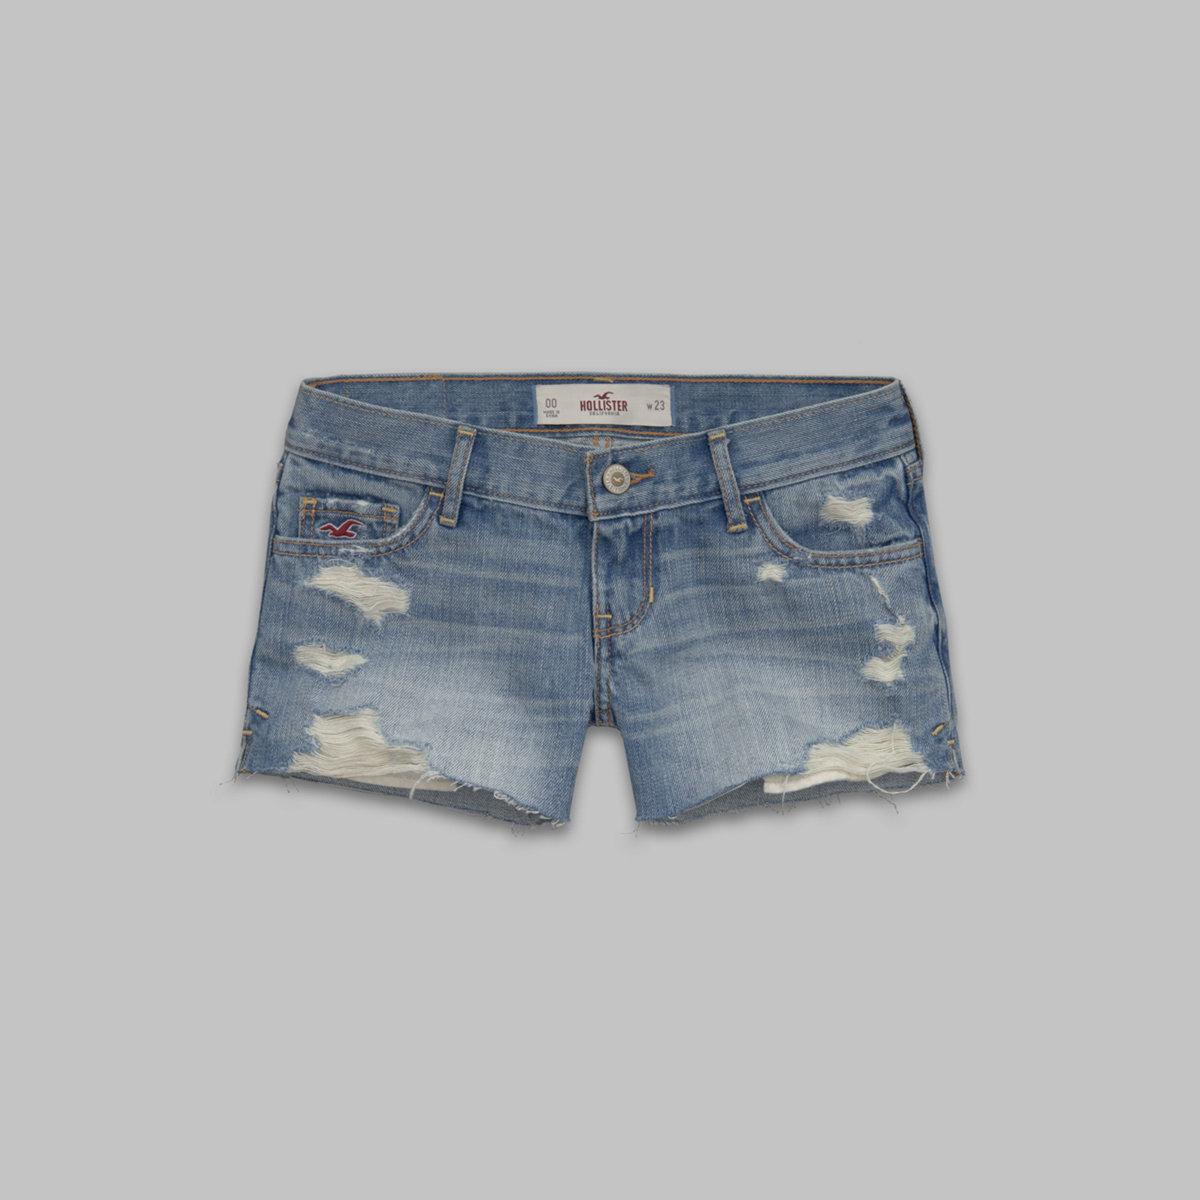 Hollister Low Rise Midi Shorts